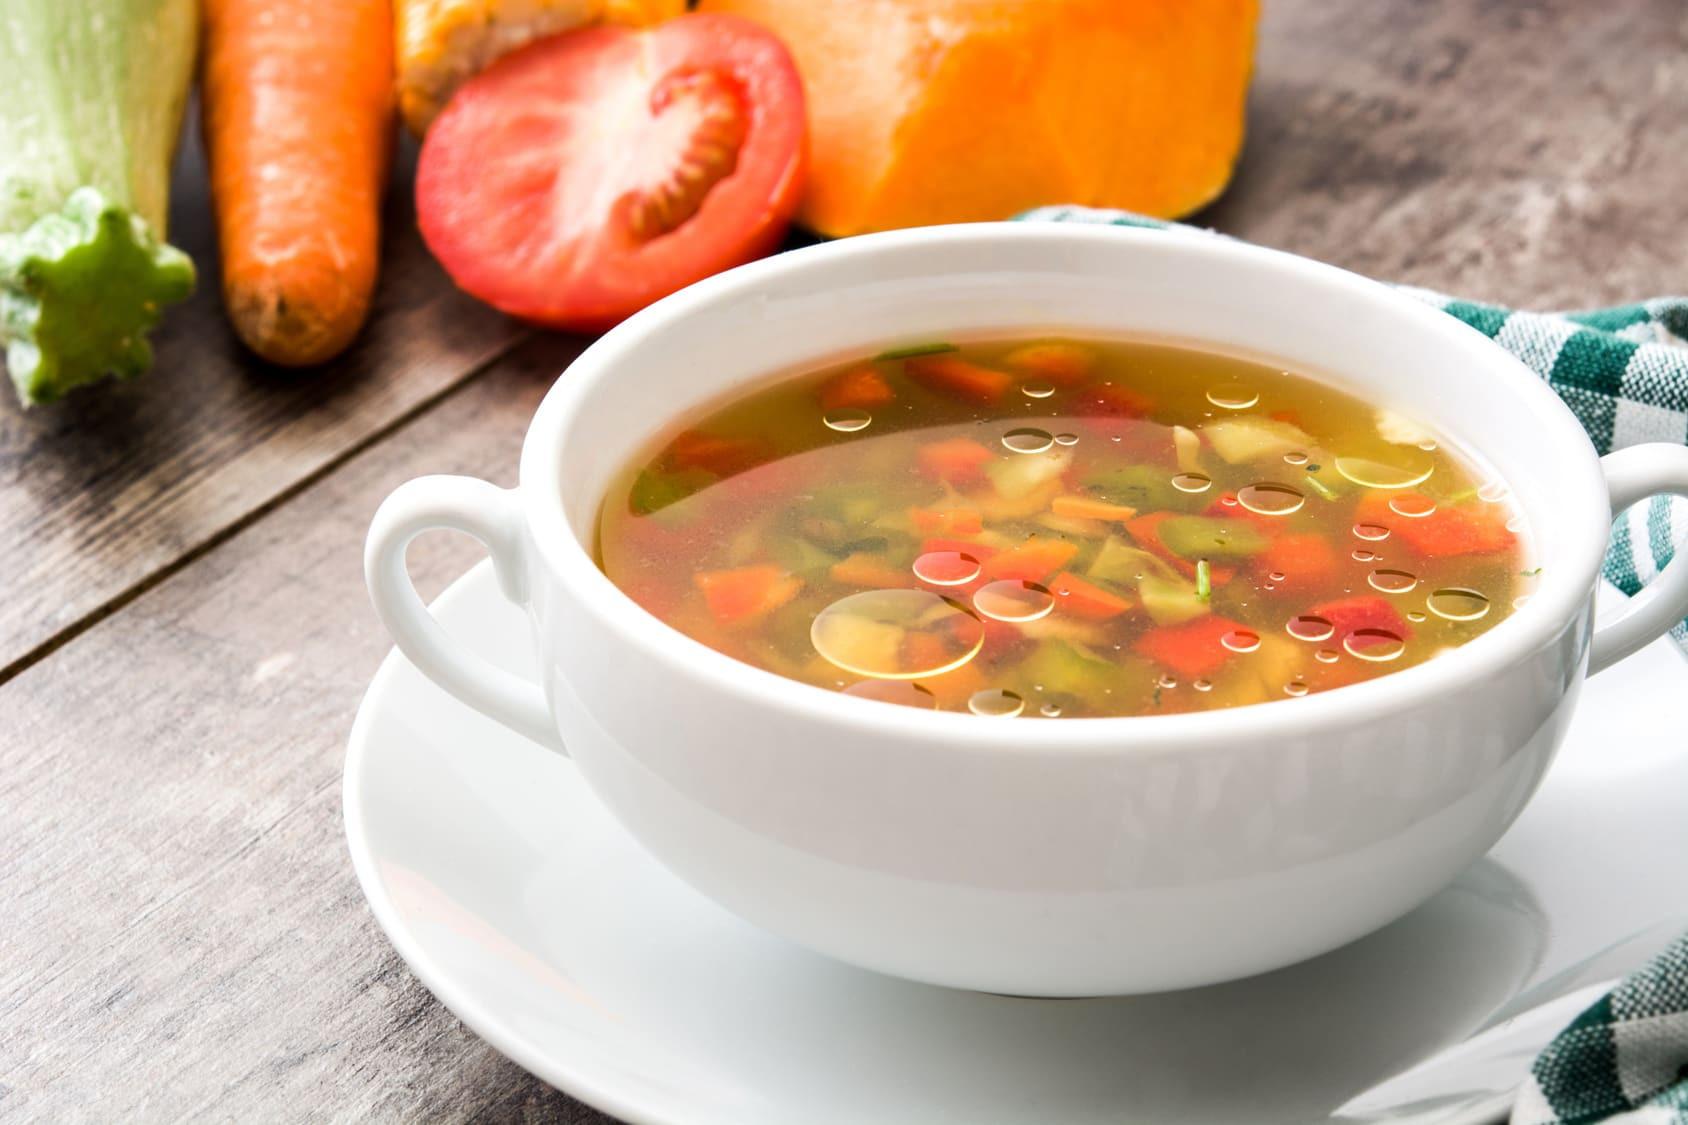 Diabetic Recipes Blog  9 Healthy and Delicious Vegan Recipes for Diabetes Vegan